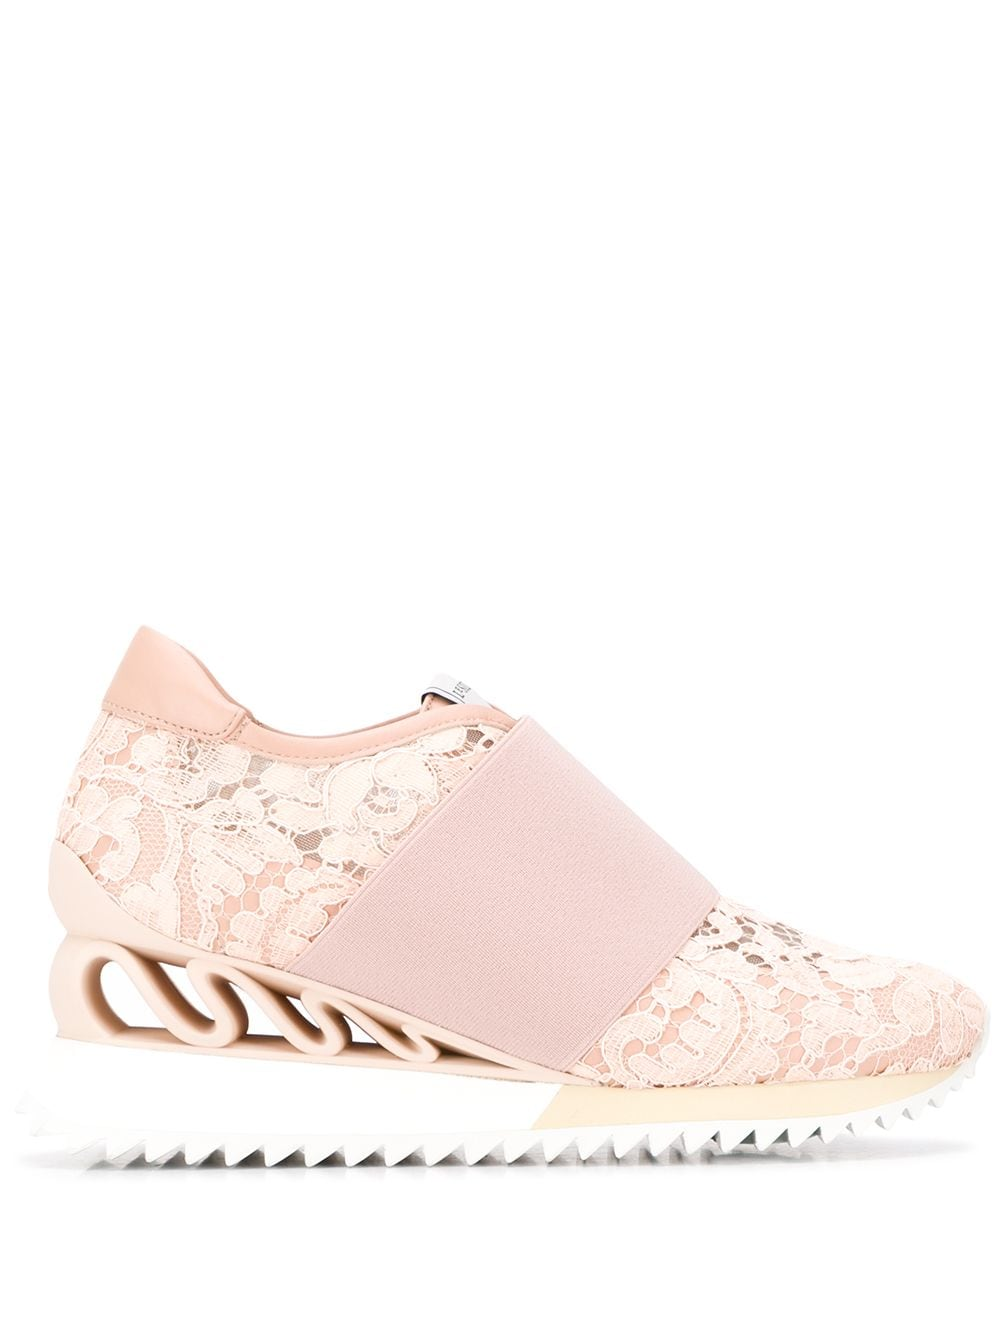 Le Silla 'Rubel Wave' Sneakers - Rosa